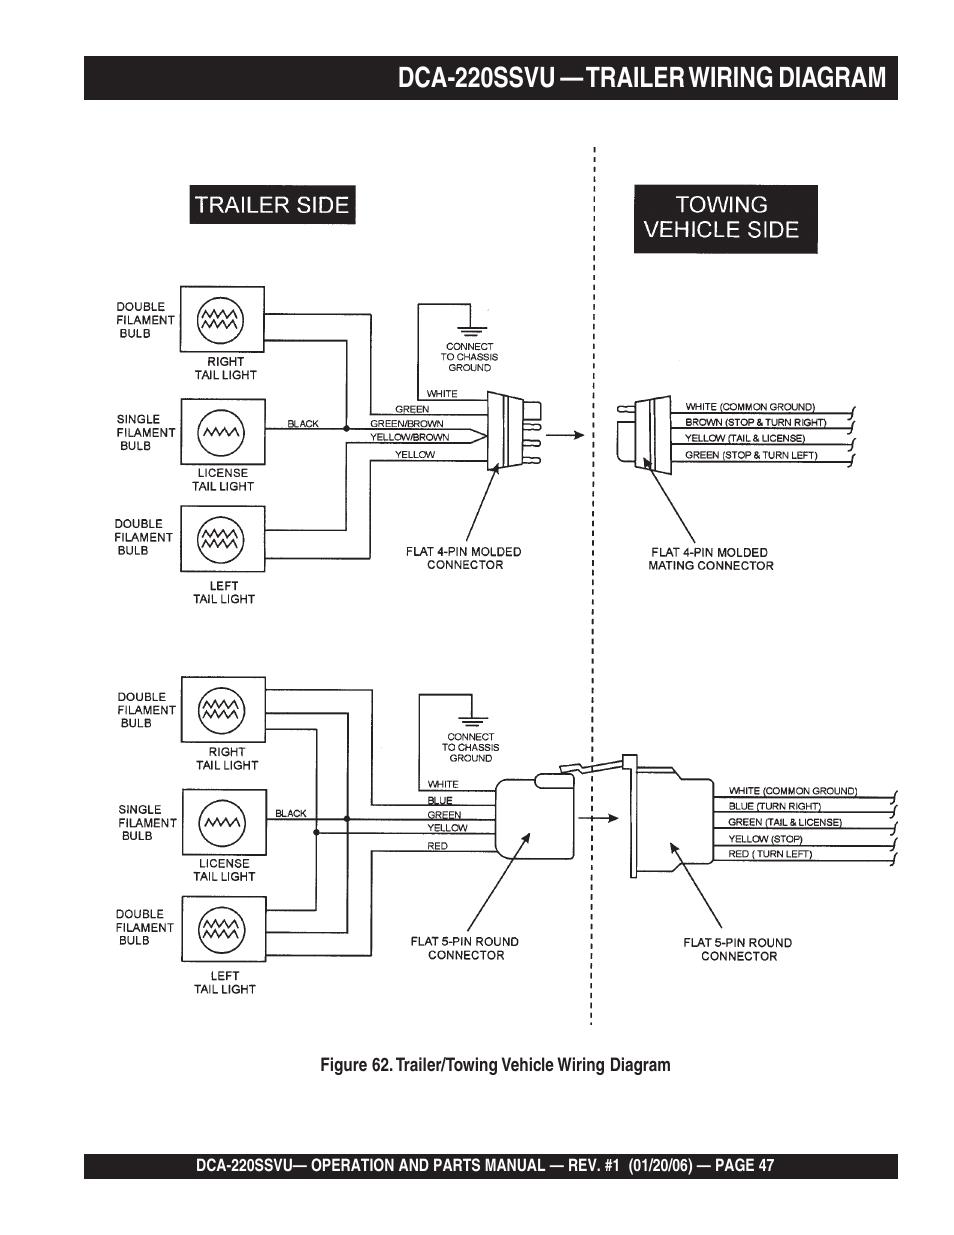 hight resolution of 1dca 220ssvu trailer wiring diagram multiquip mq power whisperwatt 60 hz generator dca